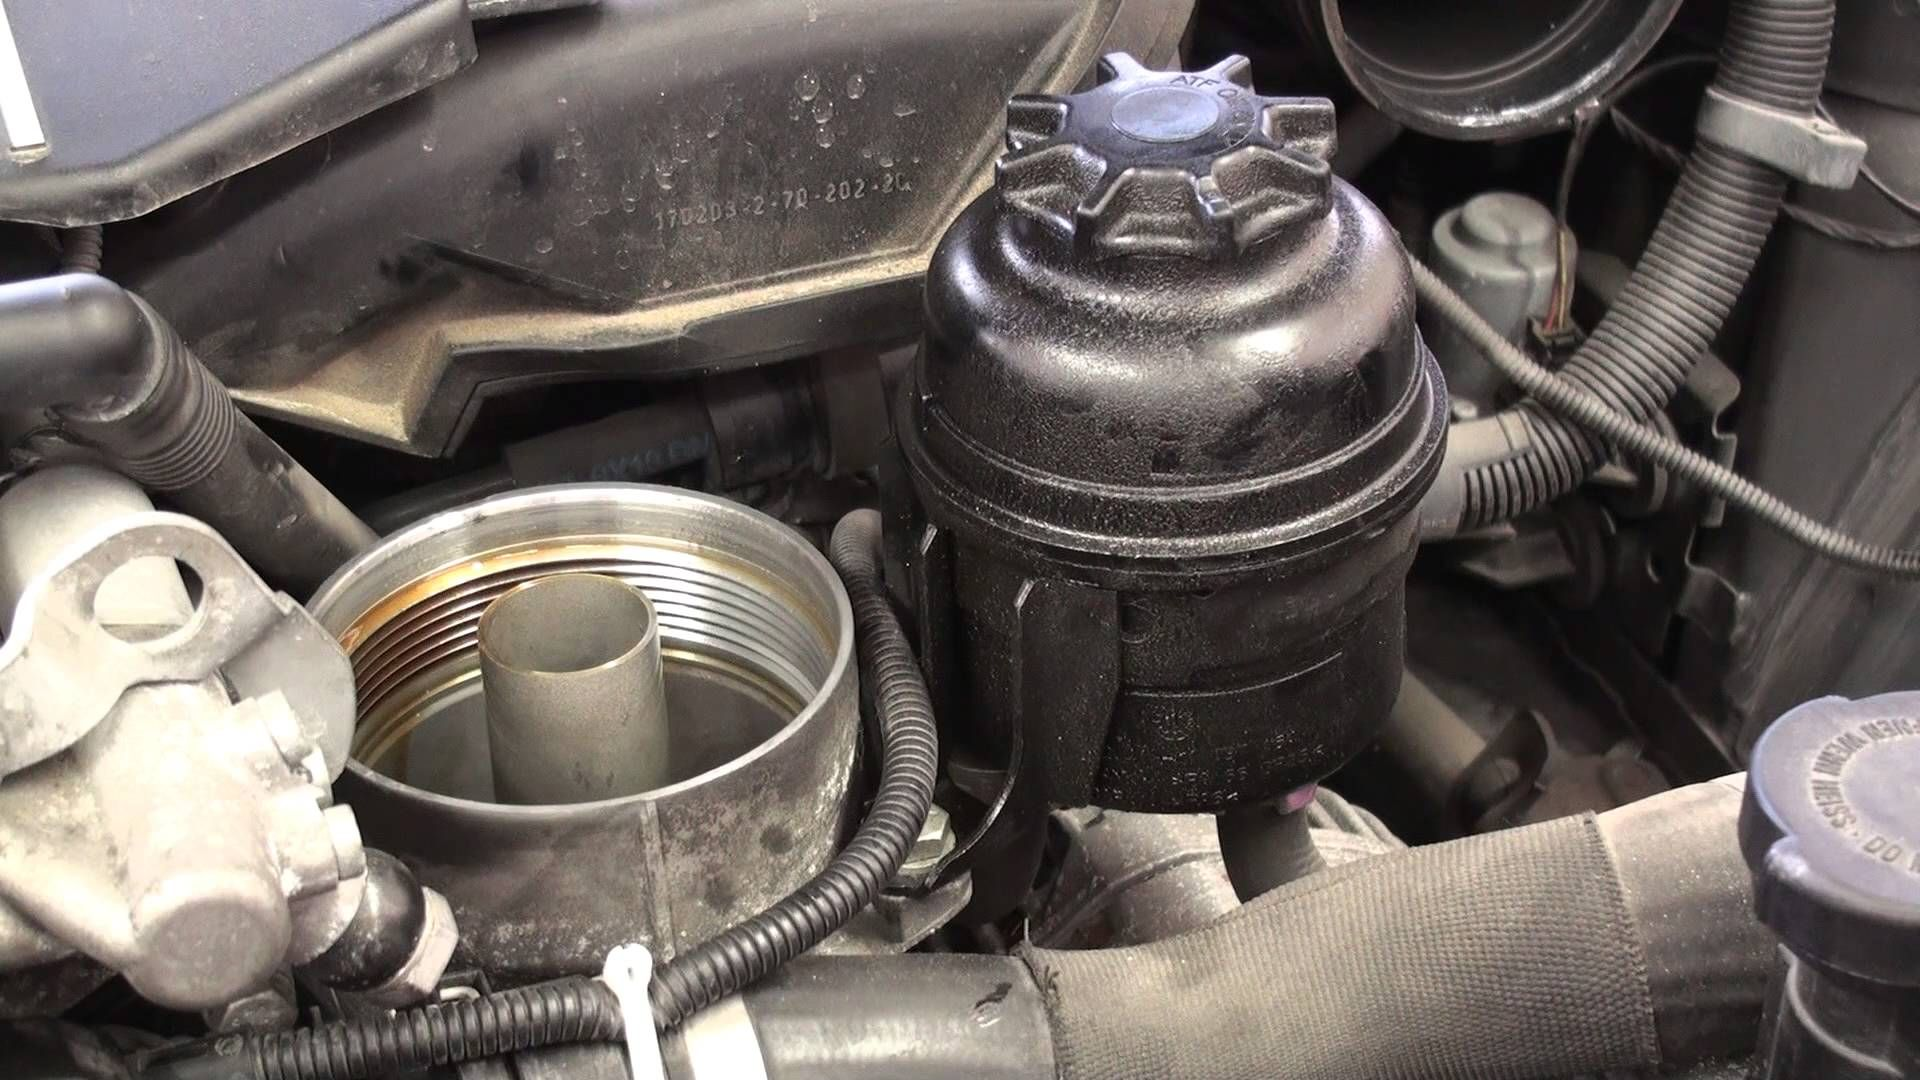 Bmw E46 Engine Oil And Filter Change Bmw E46 Bmw Diy Repair